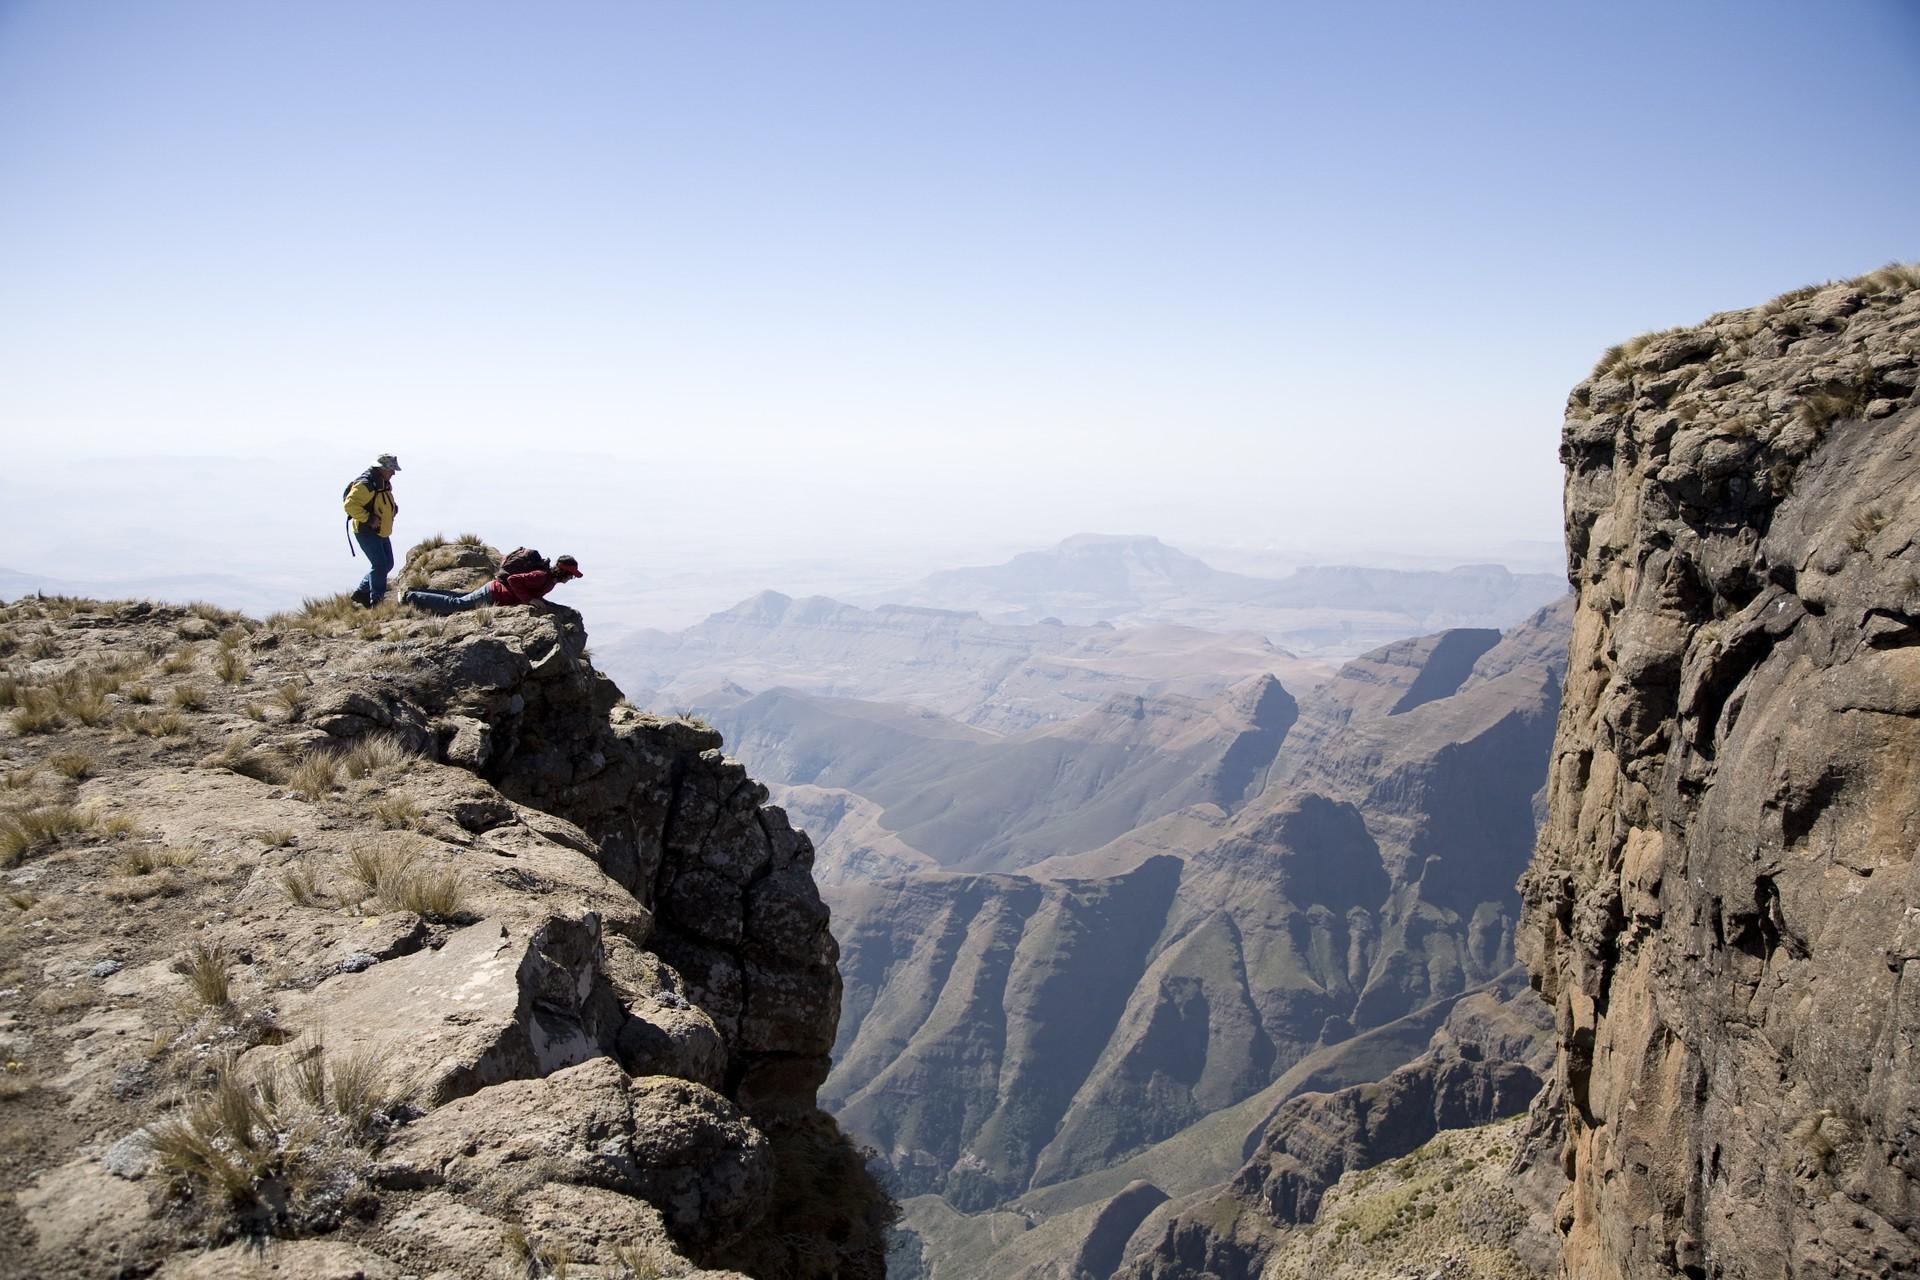 Hikers peering over cliff in Drakensberg Amphitheatre